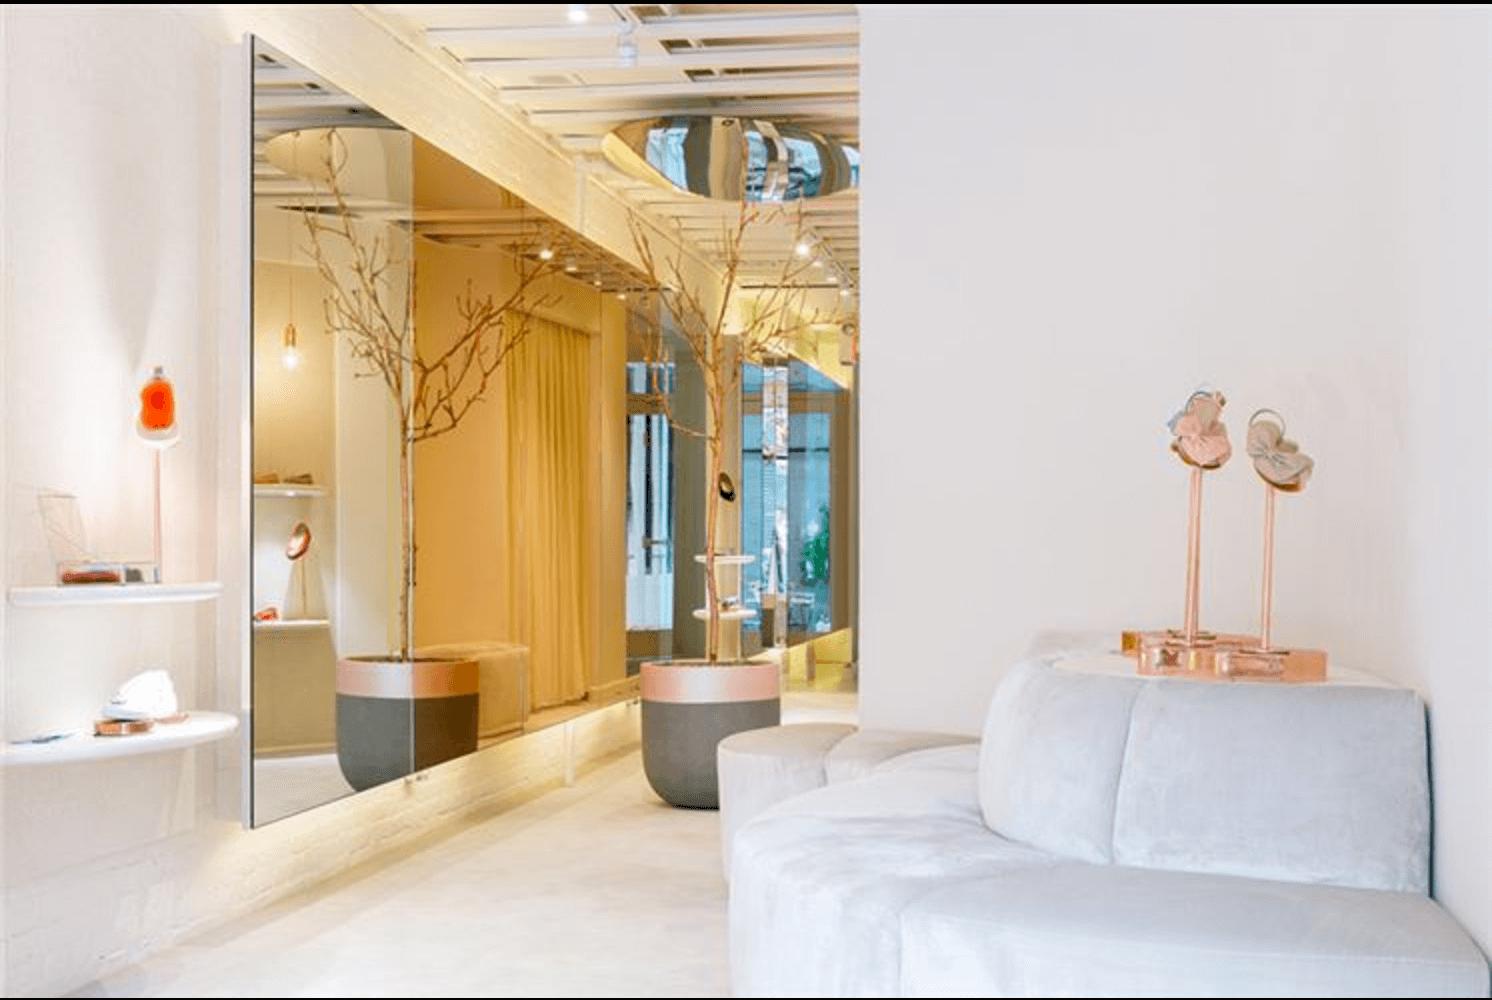 Reflective Mirrors Beautify this Manhattan Apartment